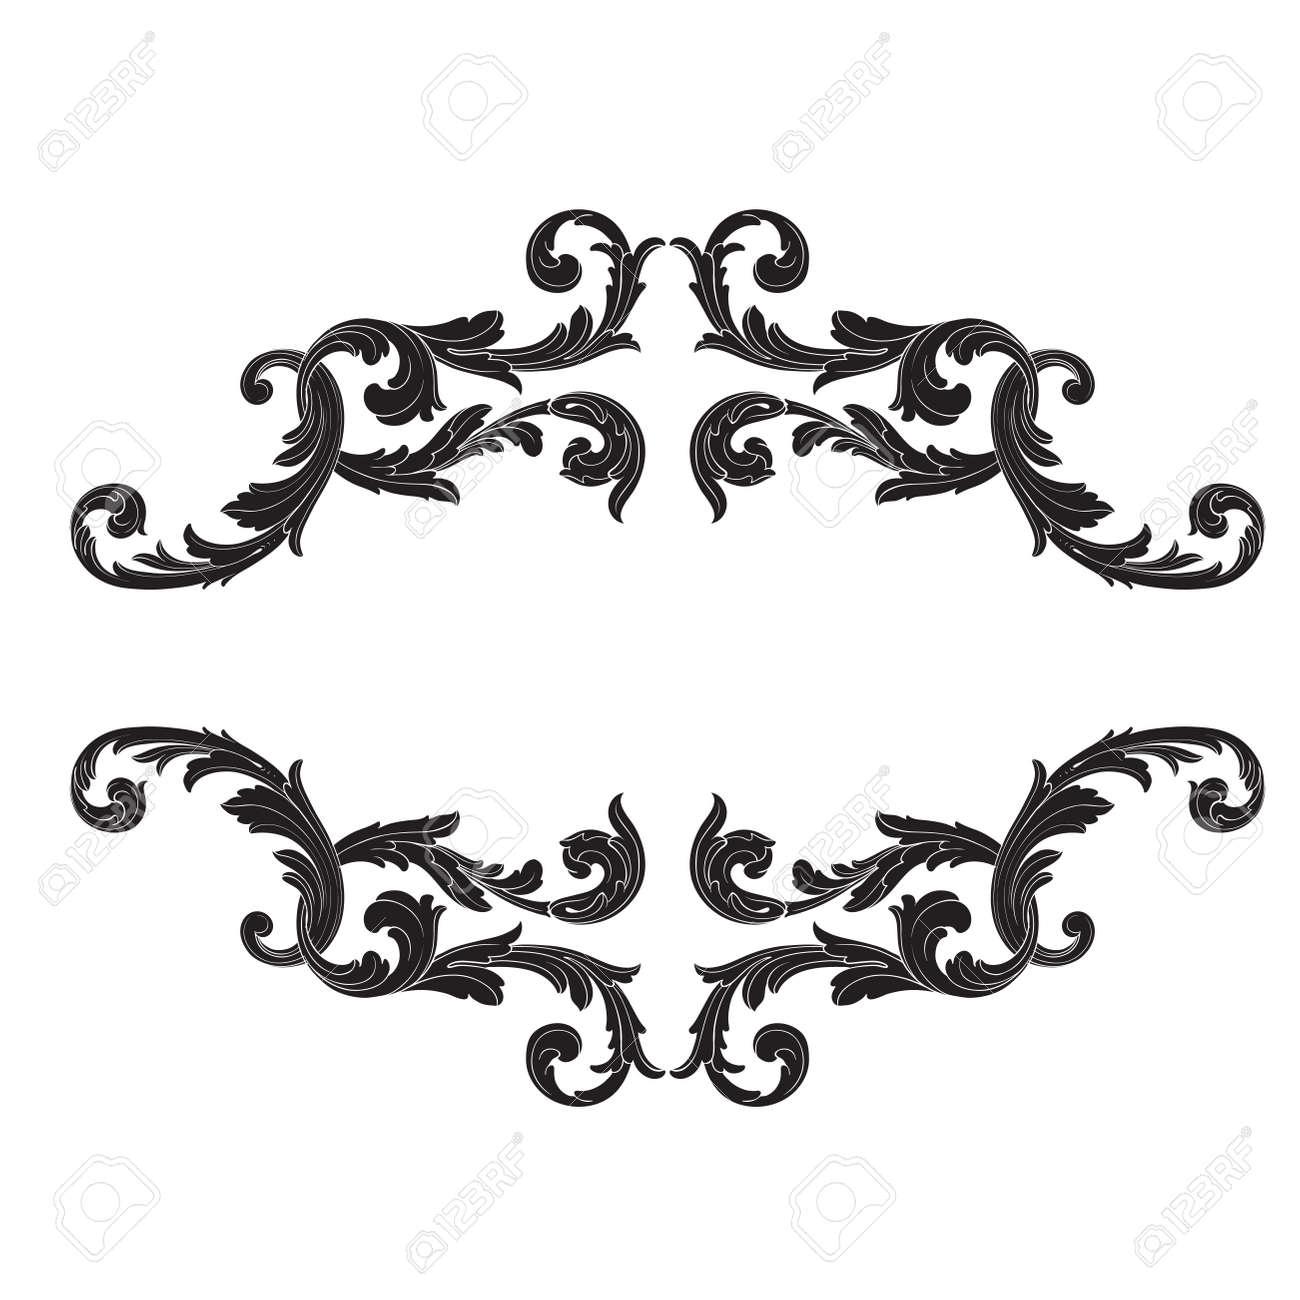 baroque vector set of vintage elements for design decorative rh 123rf com vector filigree corners vector filigree corners